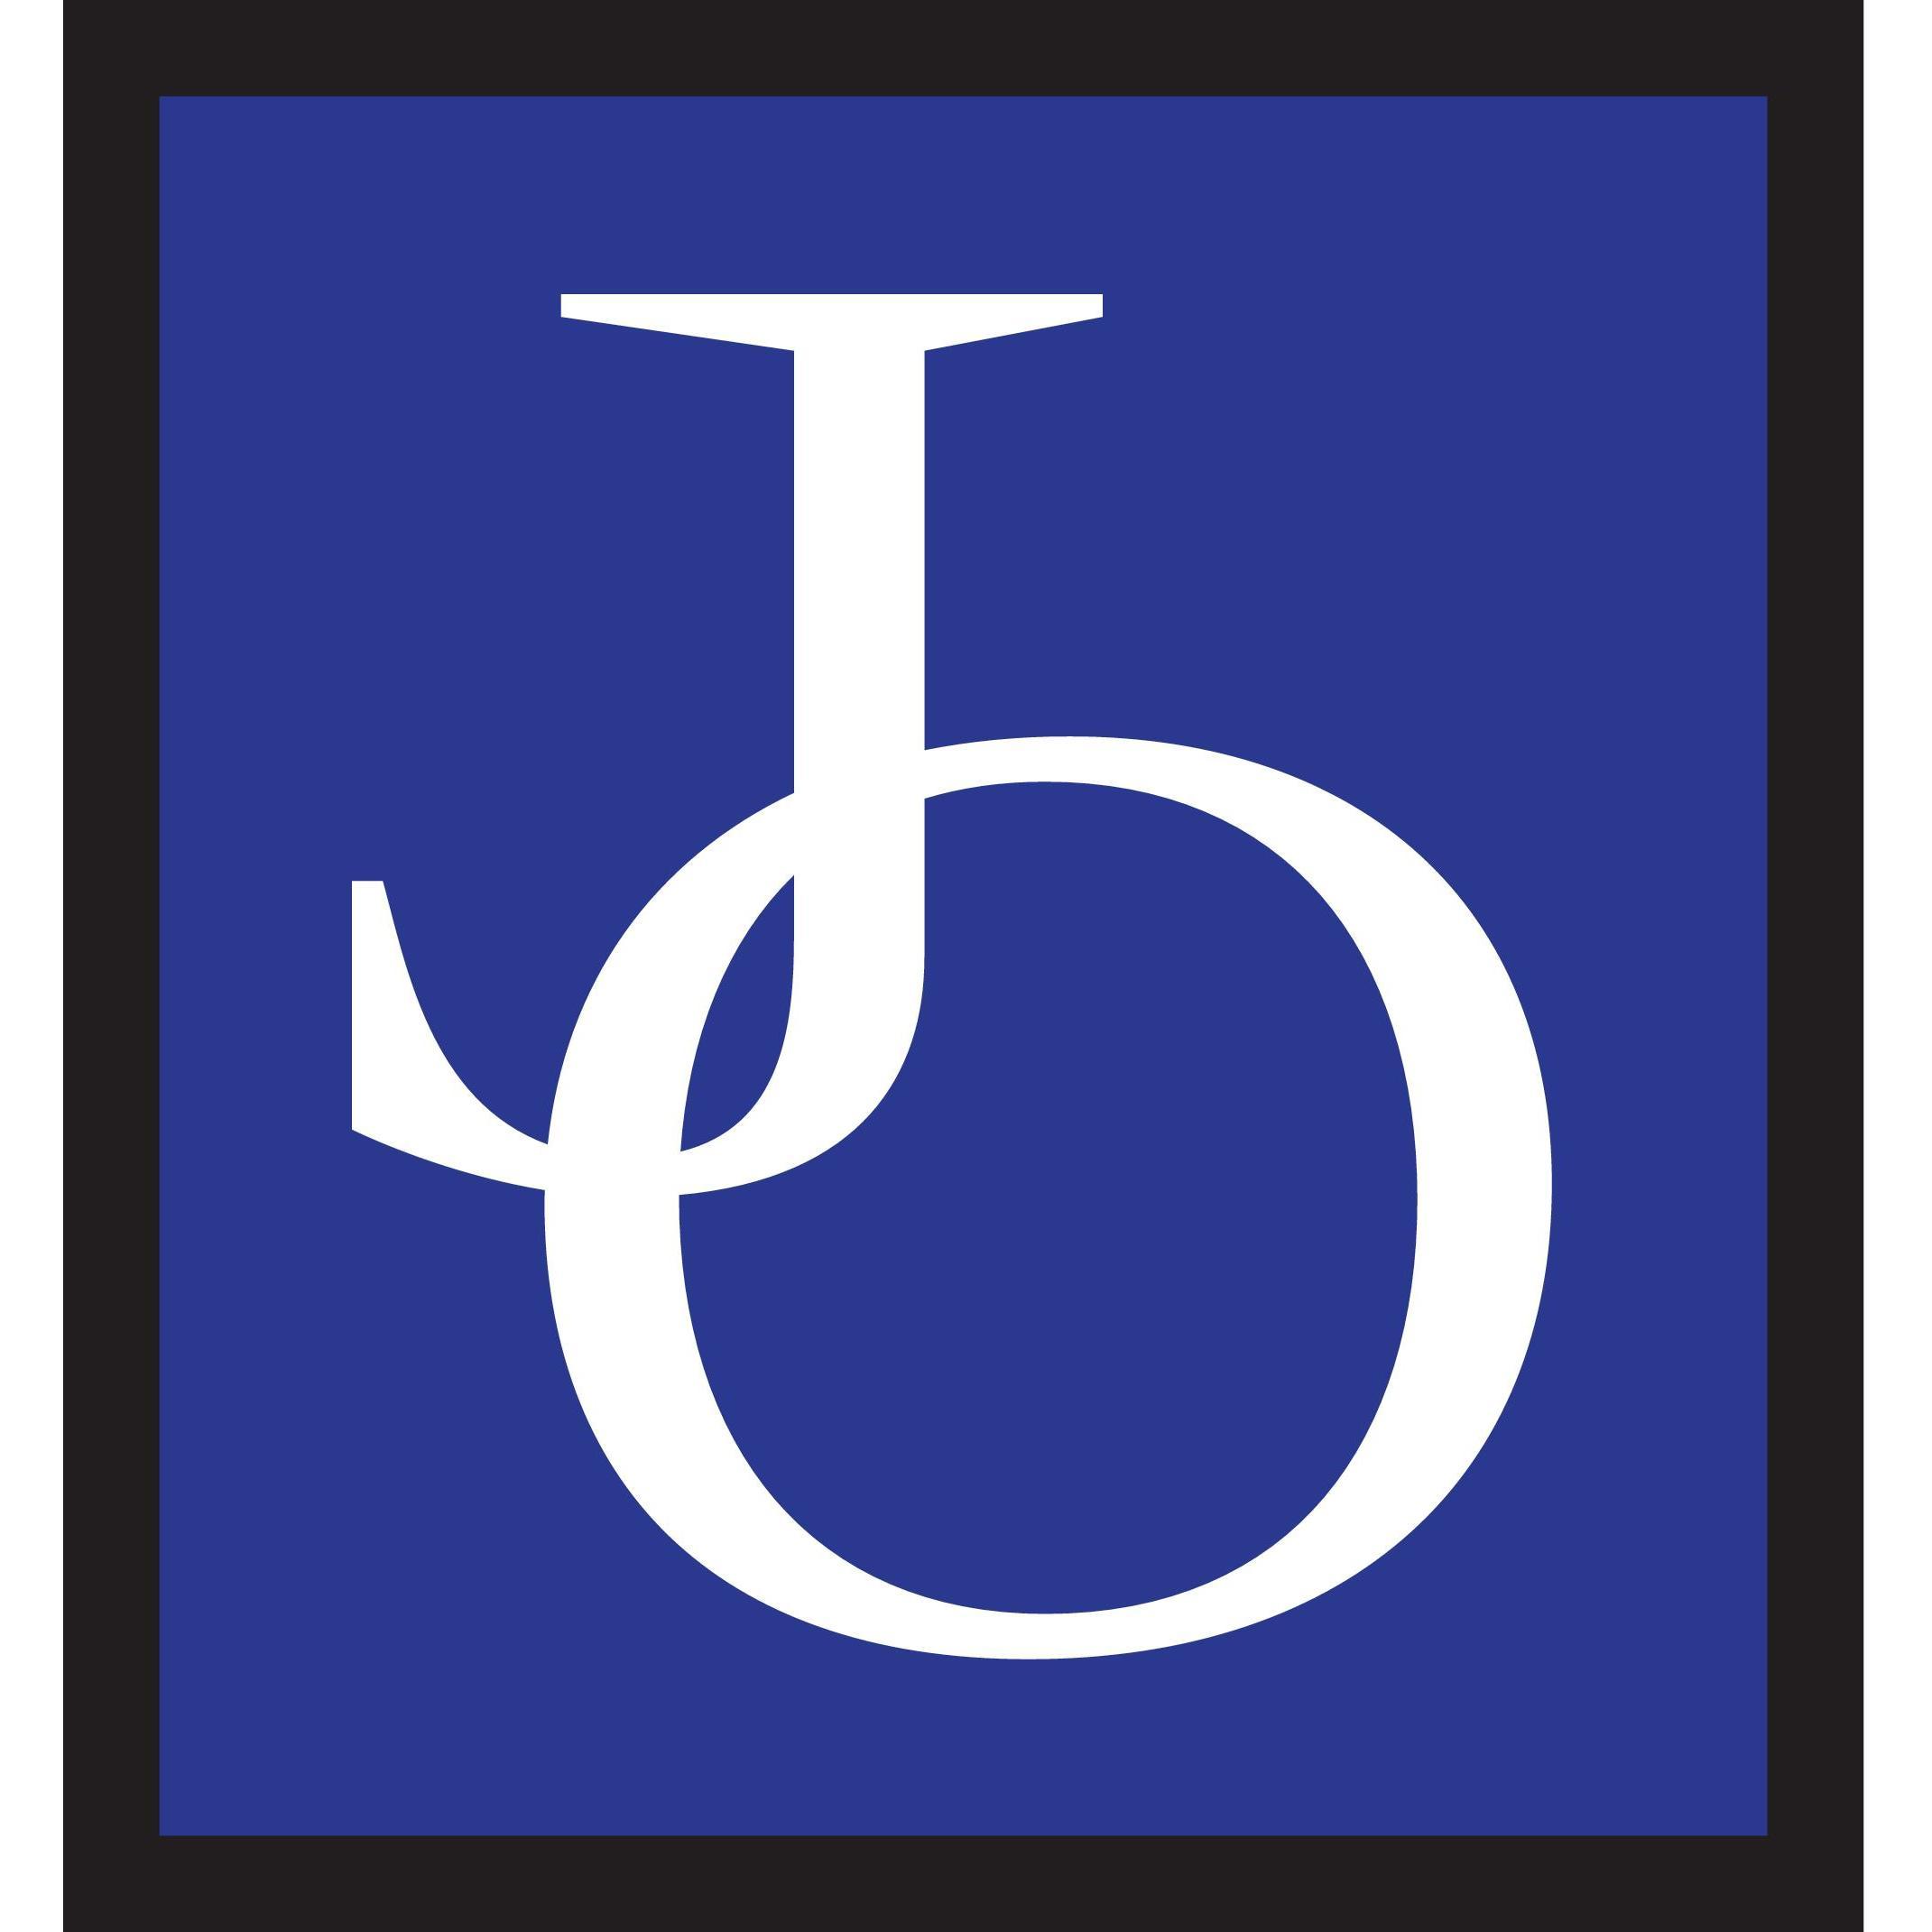 Jackson O'Keefe, LLP Wethersfield Law Firm